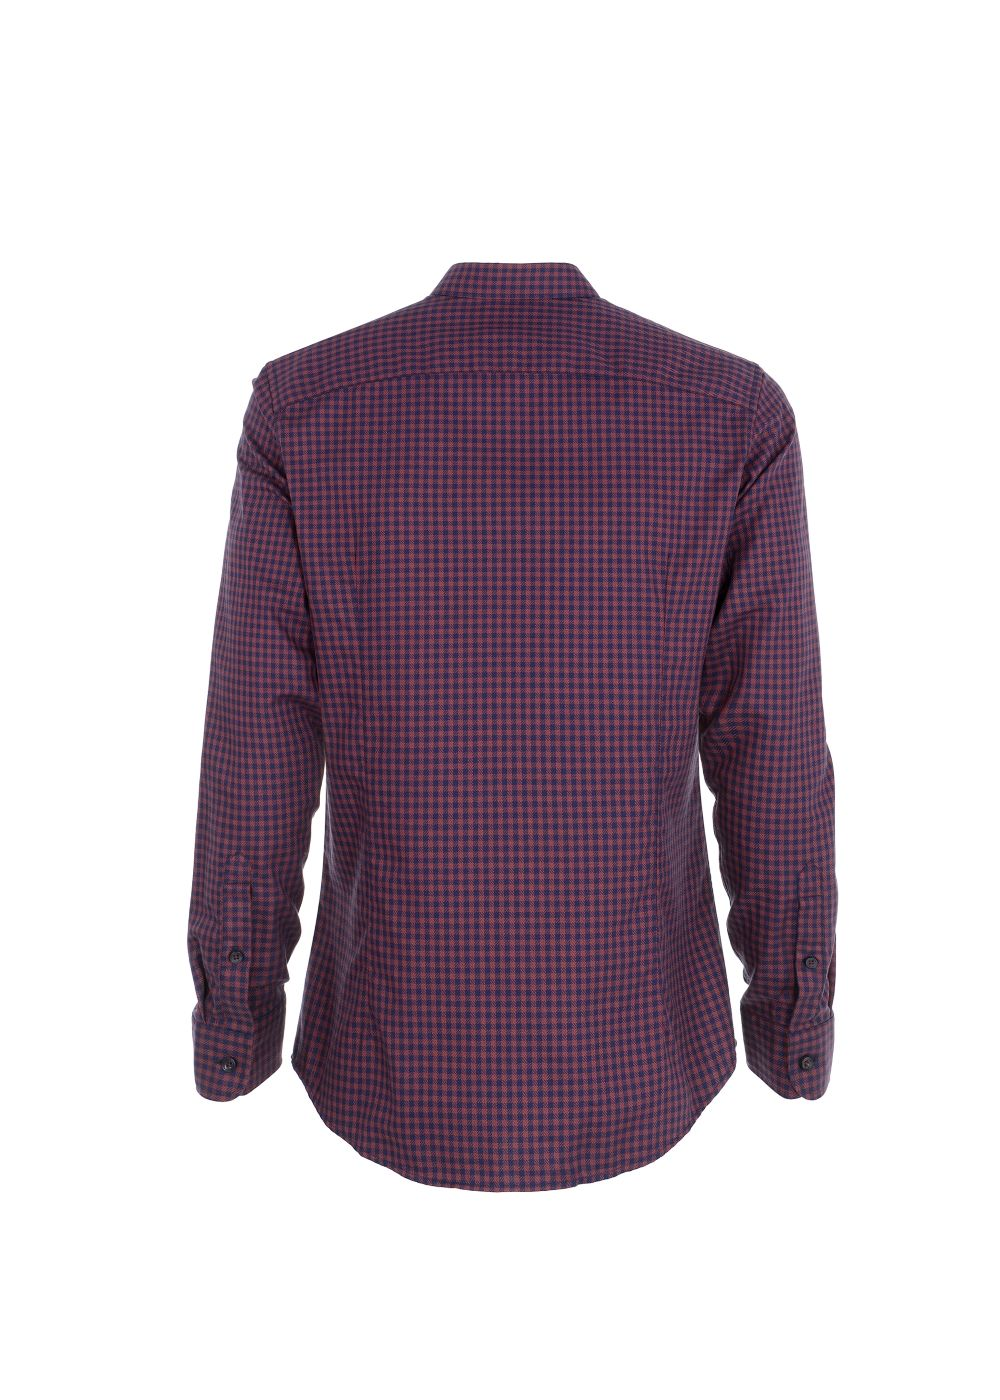 Koszula męska KOSMT-0151-49(Z19)